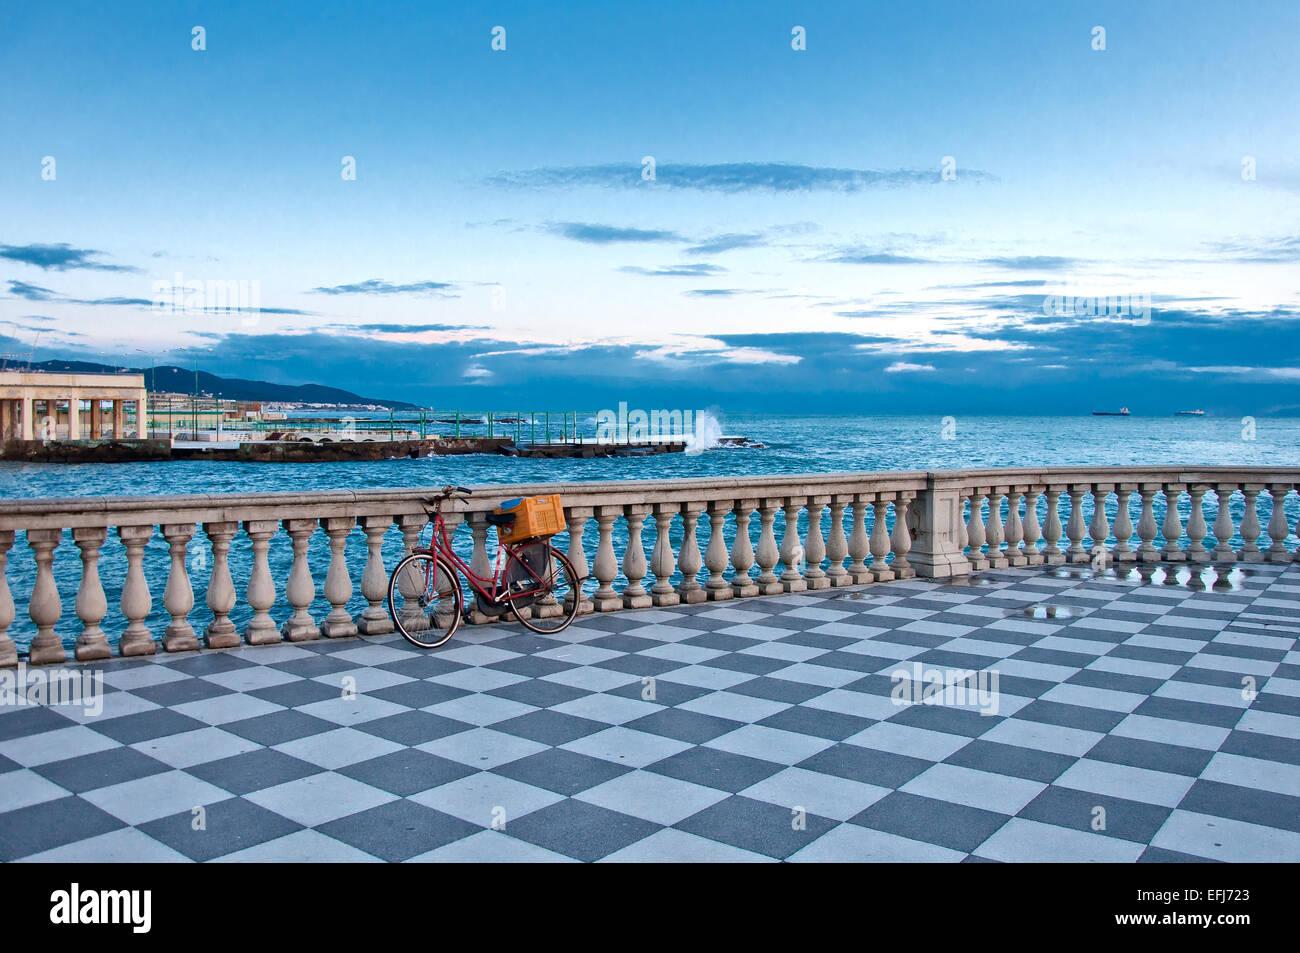 Mascagni terrace and Mediterranean sea in Livorno. Tuscany - Italy. - Stock Image